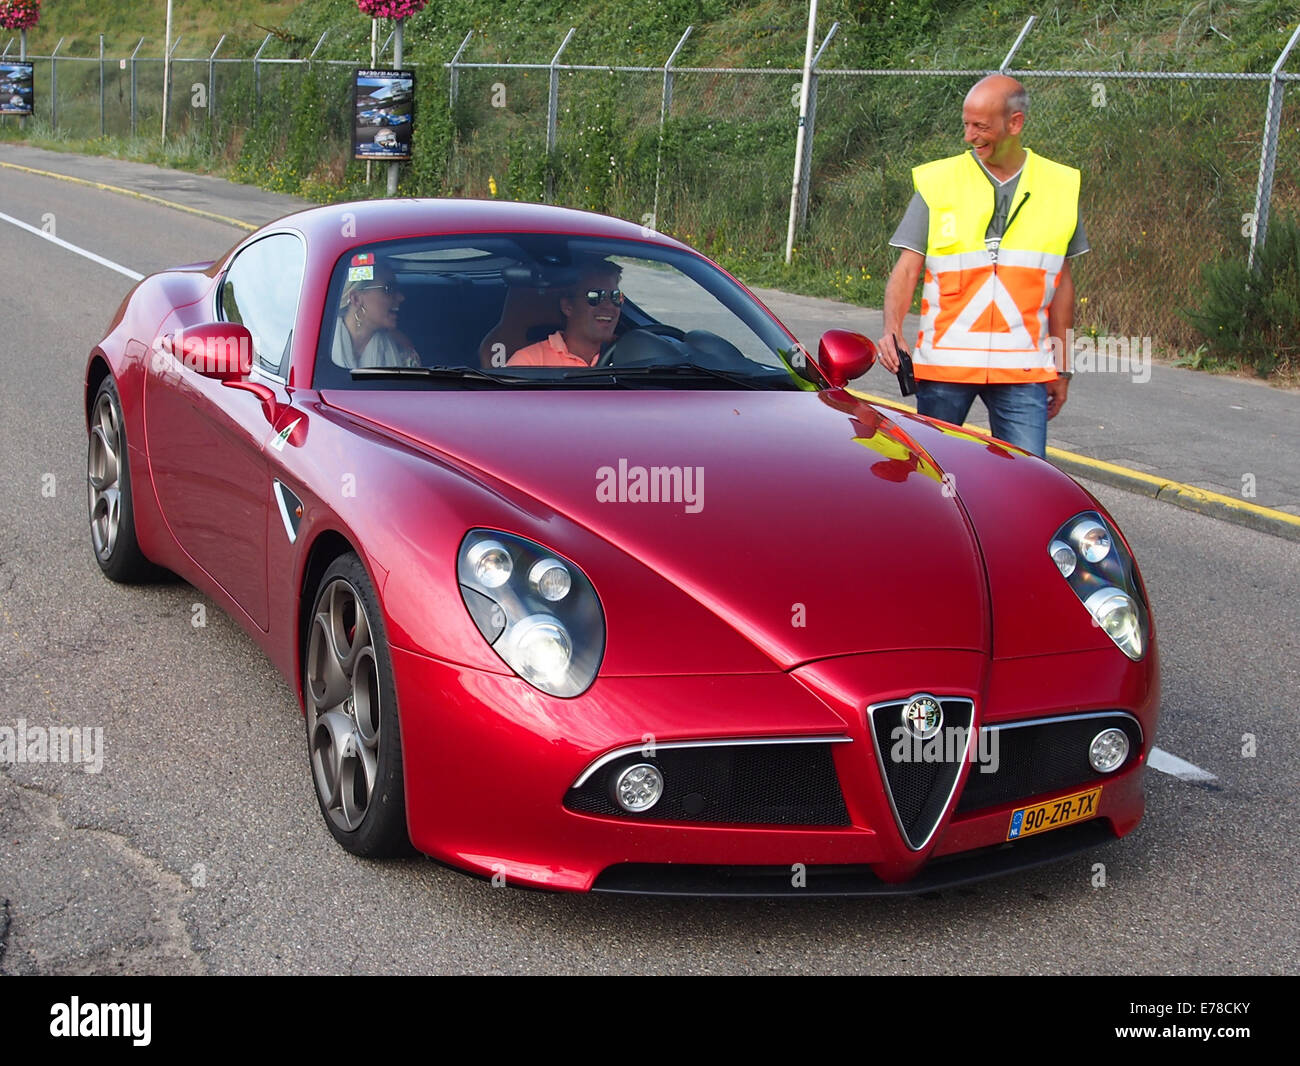 2008 ALFA ROMEO AR8C COMPETIZIONE, Lizenz 90-ZR-TX, pic1 Stockbild